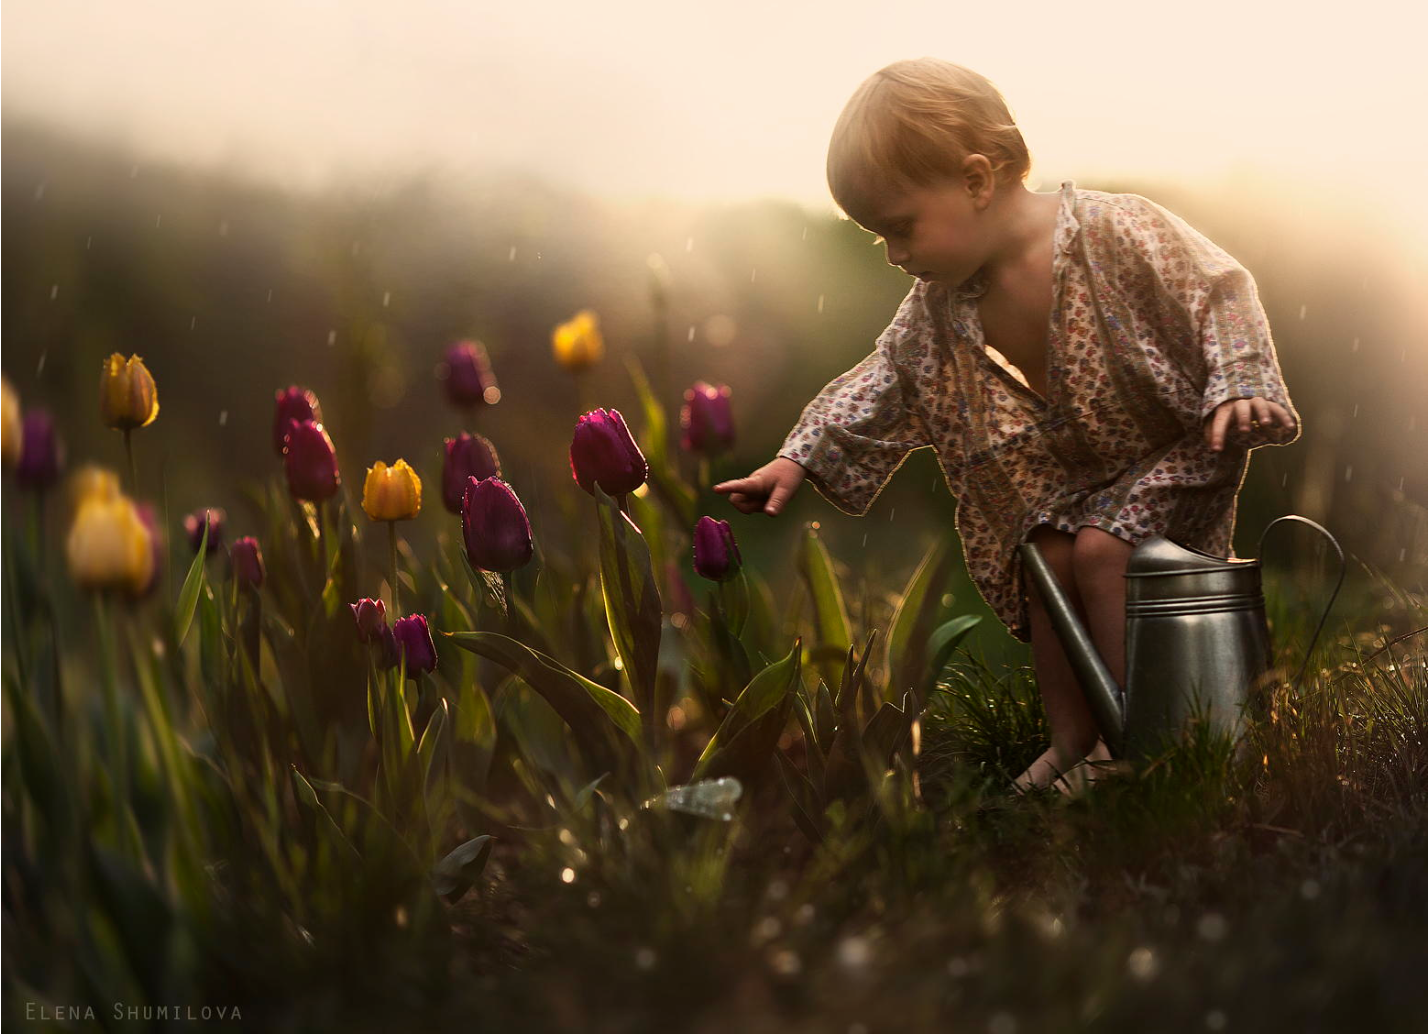 Elena Shumilova – Photographie – Tulipes